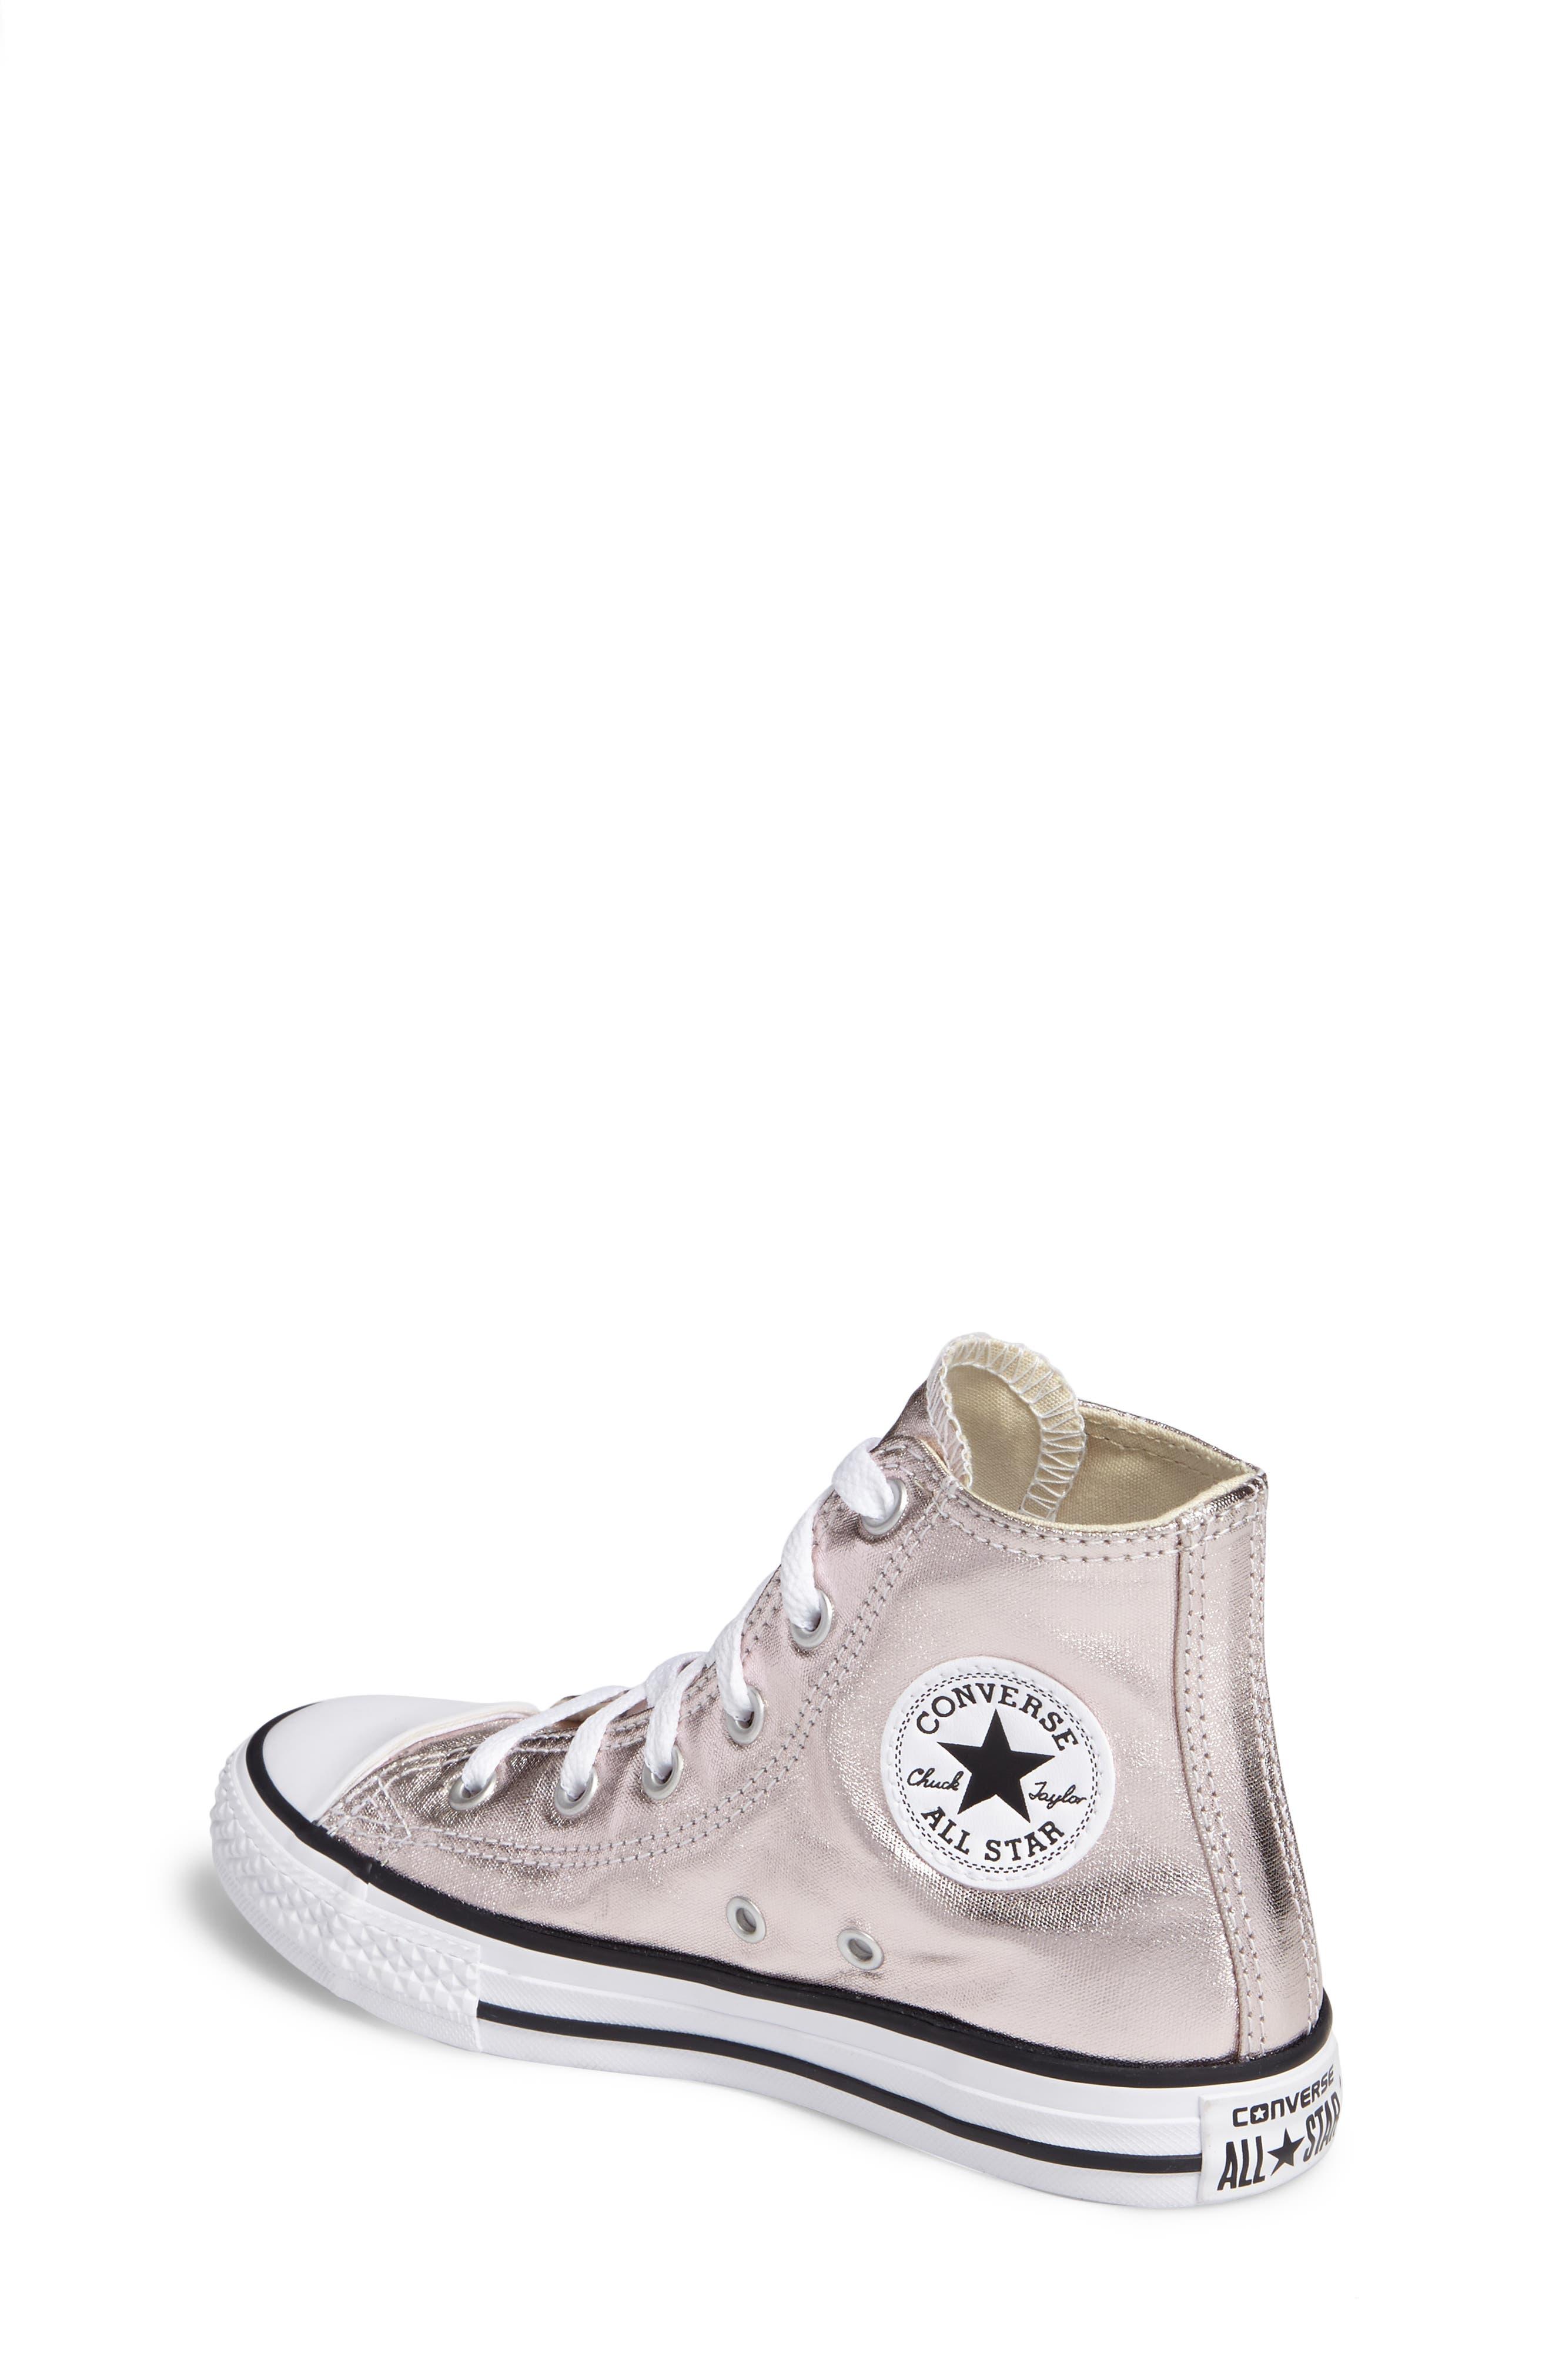 Chuck Taylor<sup>®</sup> All Star<sup>®</sup> Seasonal Metallic High Top Sneaker,                             Alternate thumbnail 2, color,                             Rose Quartz/ White Canvas